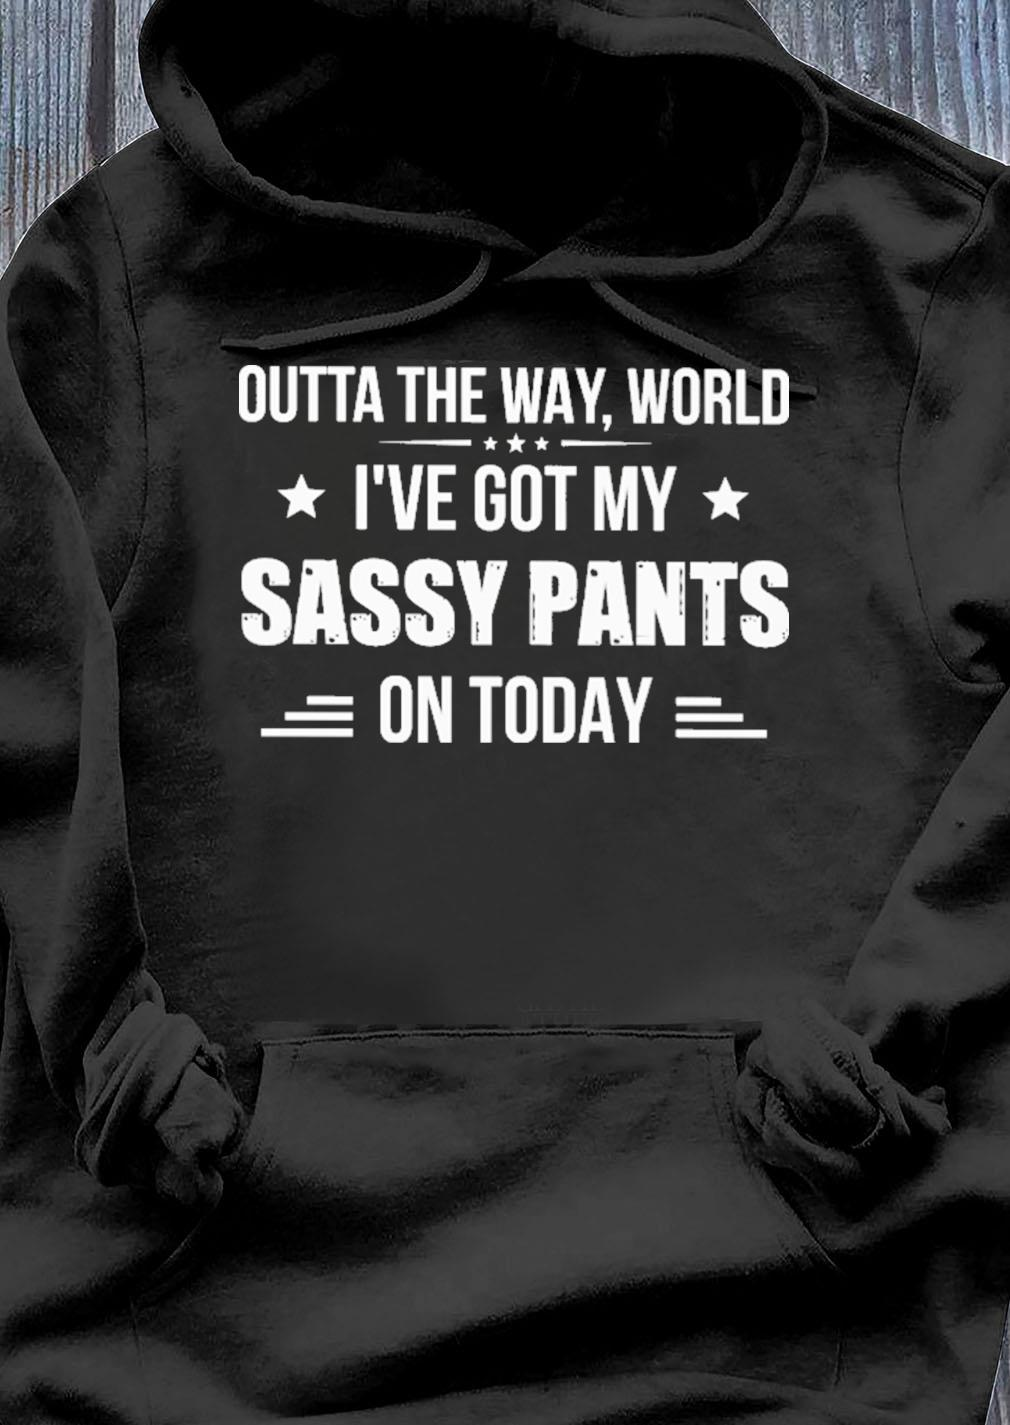 Out The Way World I\u2019ve Got My Sassy Pants On T-Shirt Cute Shirt Mom Life Shirt Attitude Shirt Sassy Pants Tee